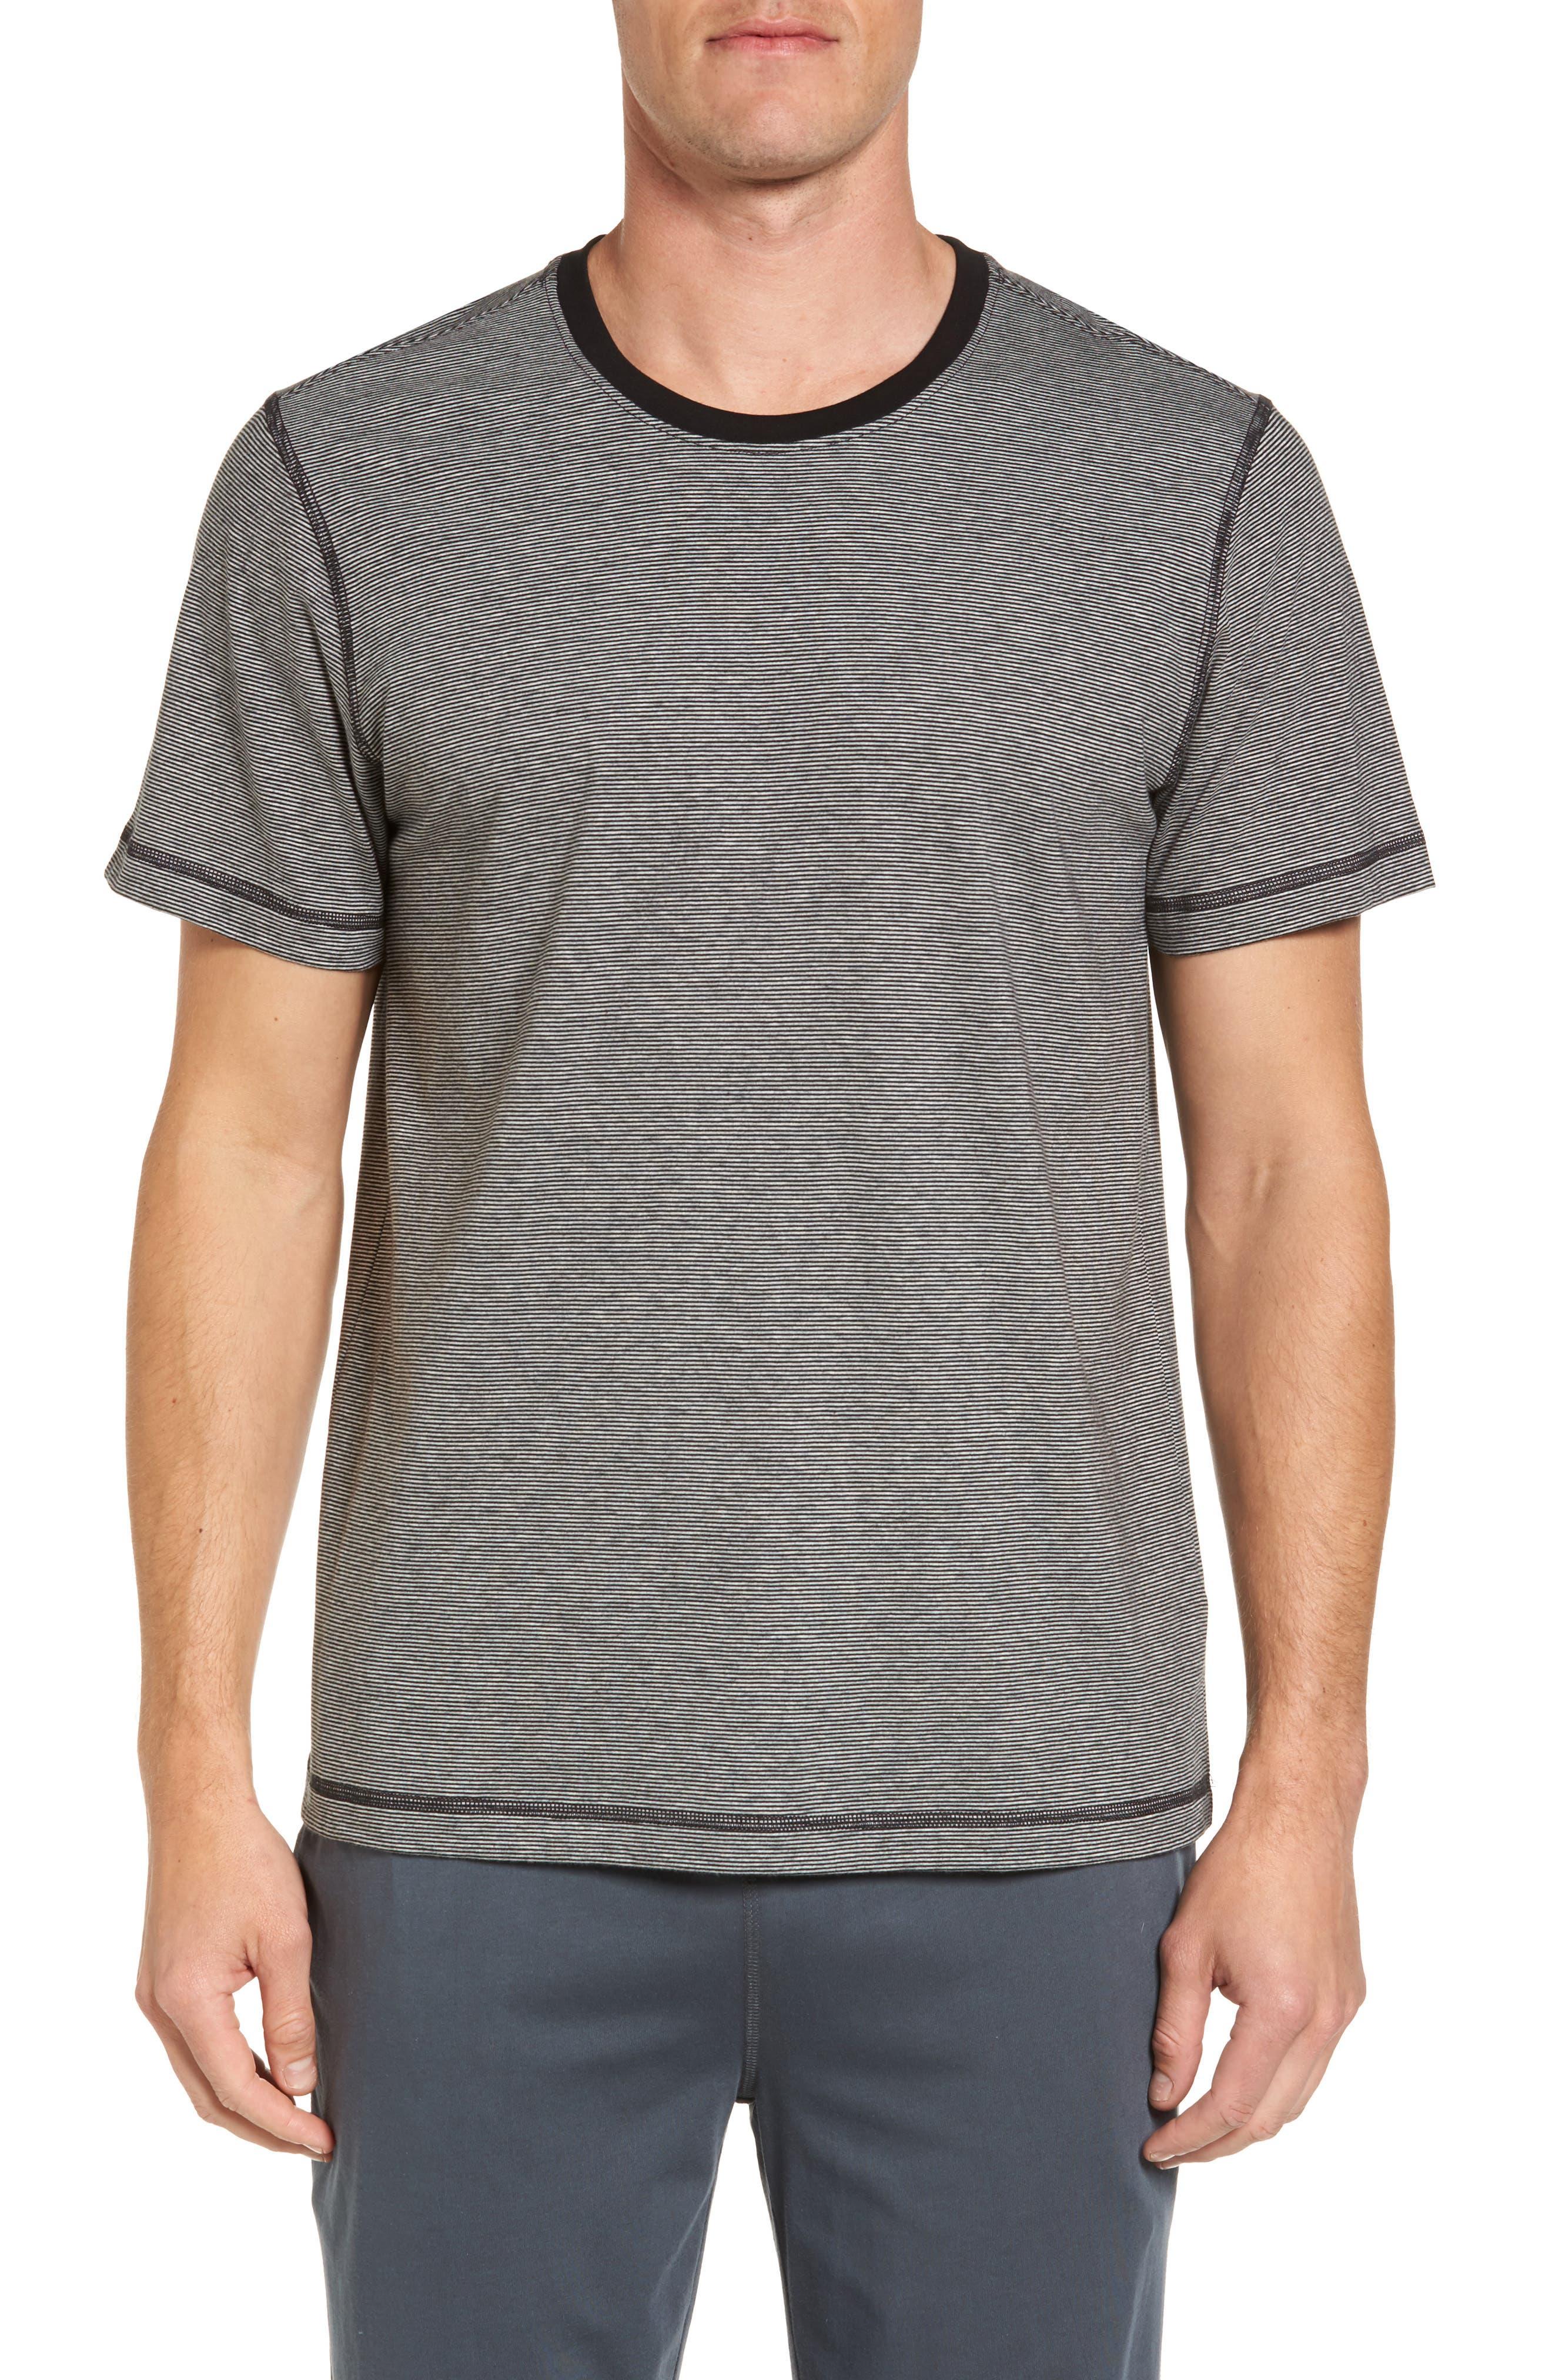 Peruvian Pima Cotton T-Shirt,                         Main,                         color, Black/ Grey Heather